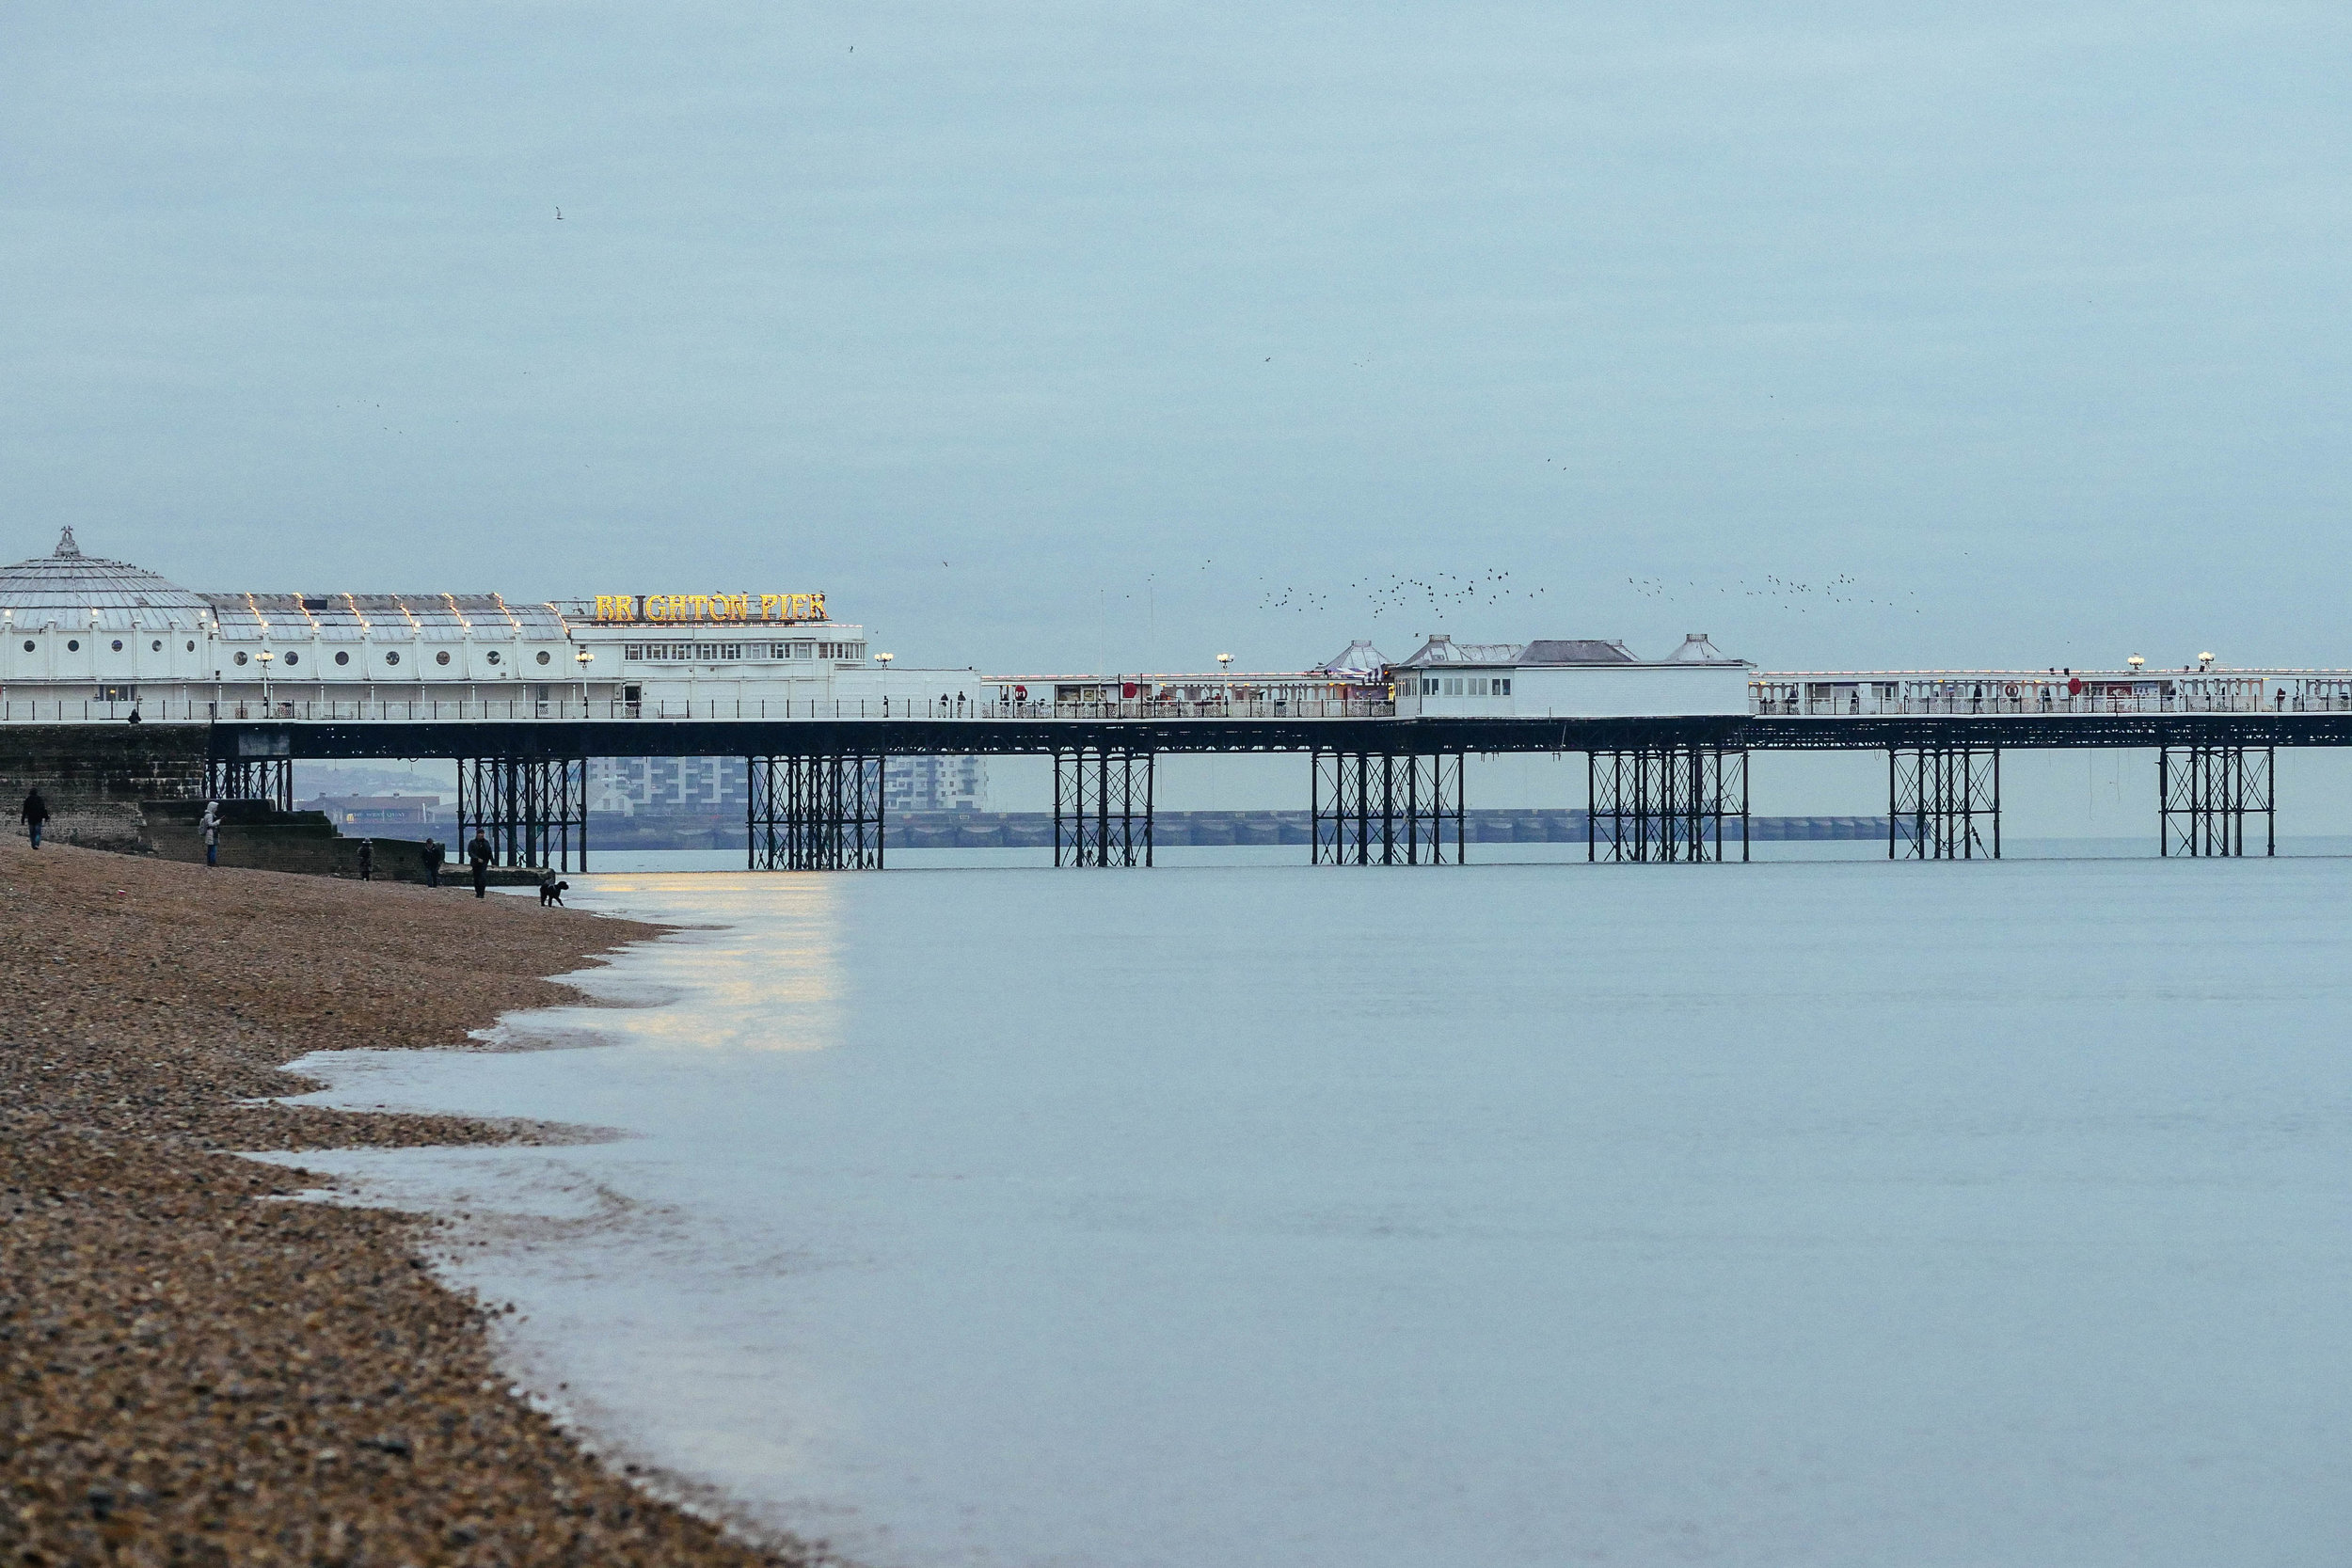 Dusk light on the Brighton Pier